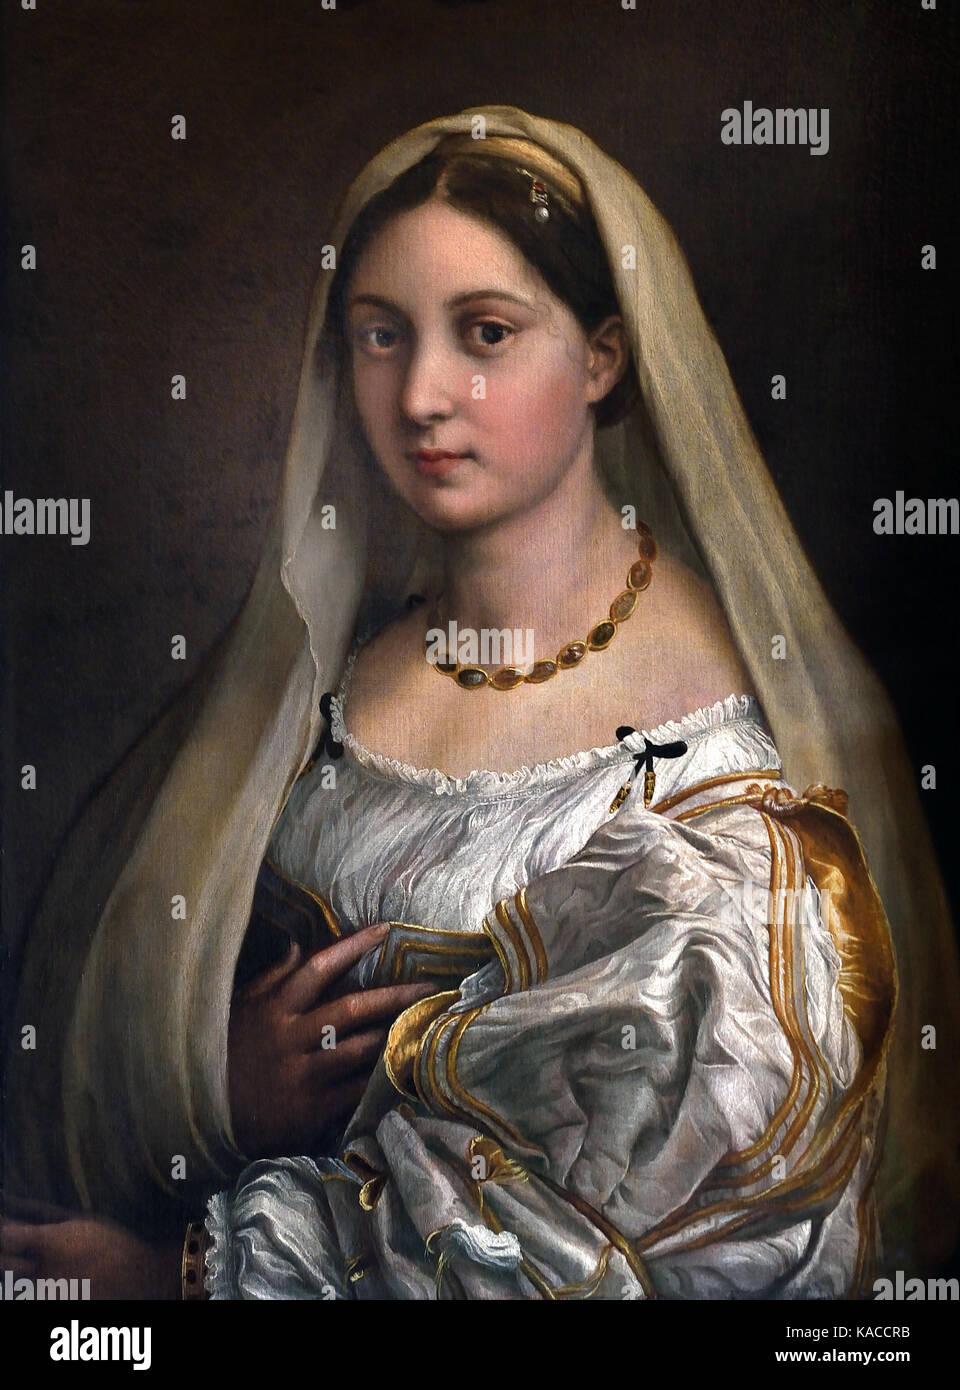 Raffaello Santi, Raffaello de Urbino, Rafael Sanzio de Urbino, Raffael 1483 - 1520 - Woman with a Veil (La Donna Stock Photo